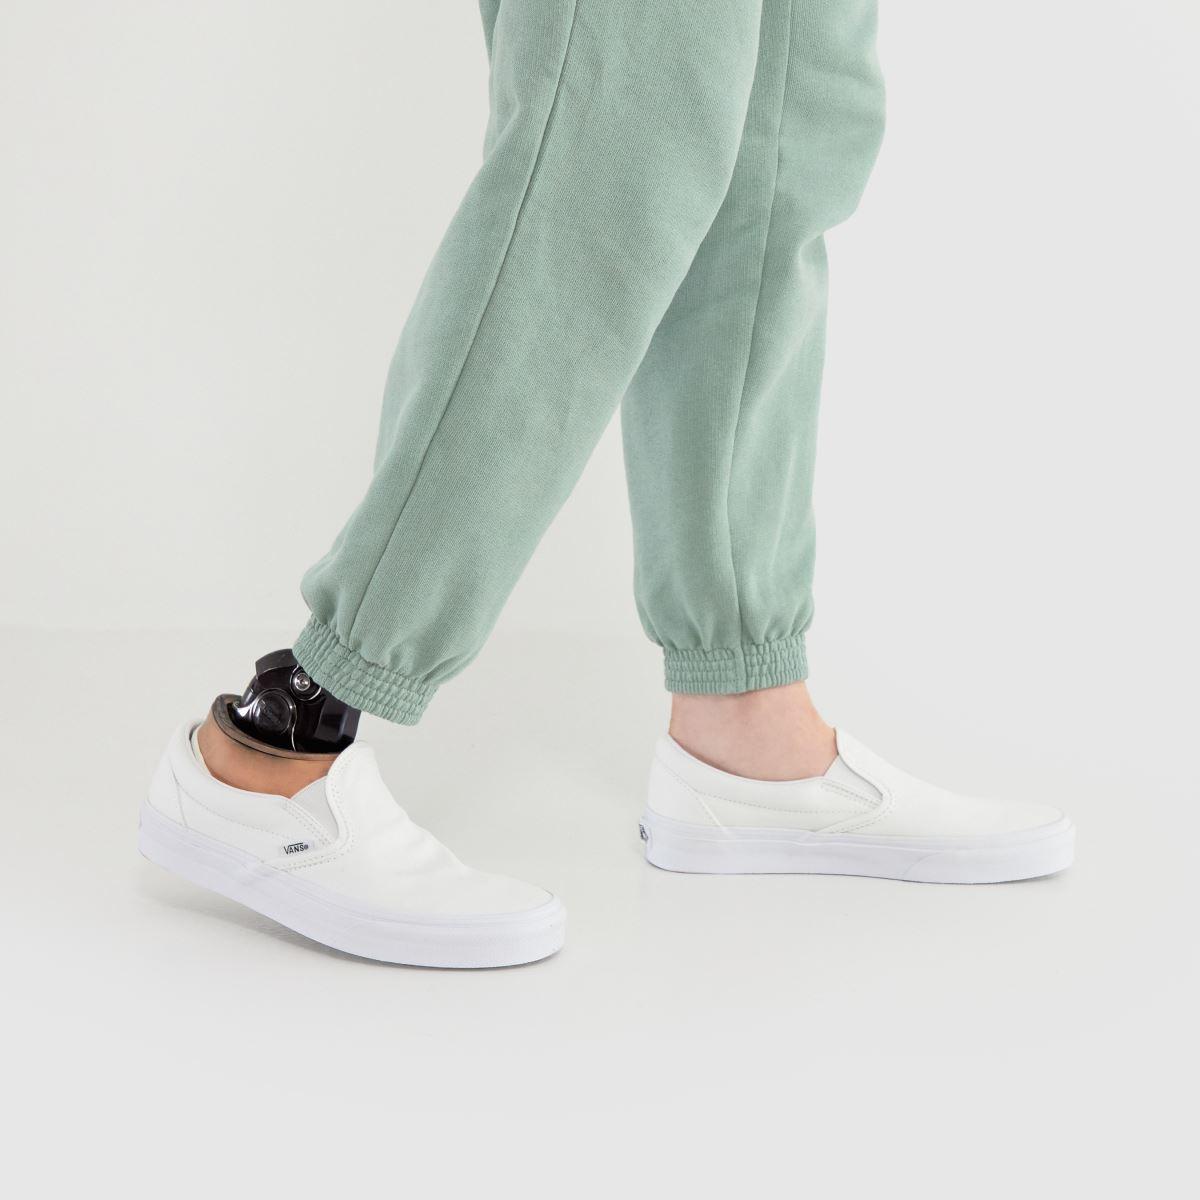 Damen Weiß vans Classic Slip Qualität Sneaker   schuh Gute Qualität Slip beliebte Schuhe d9da91